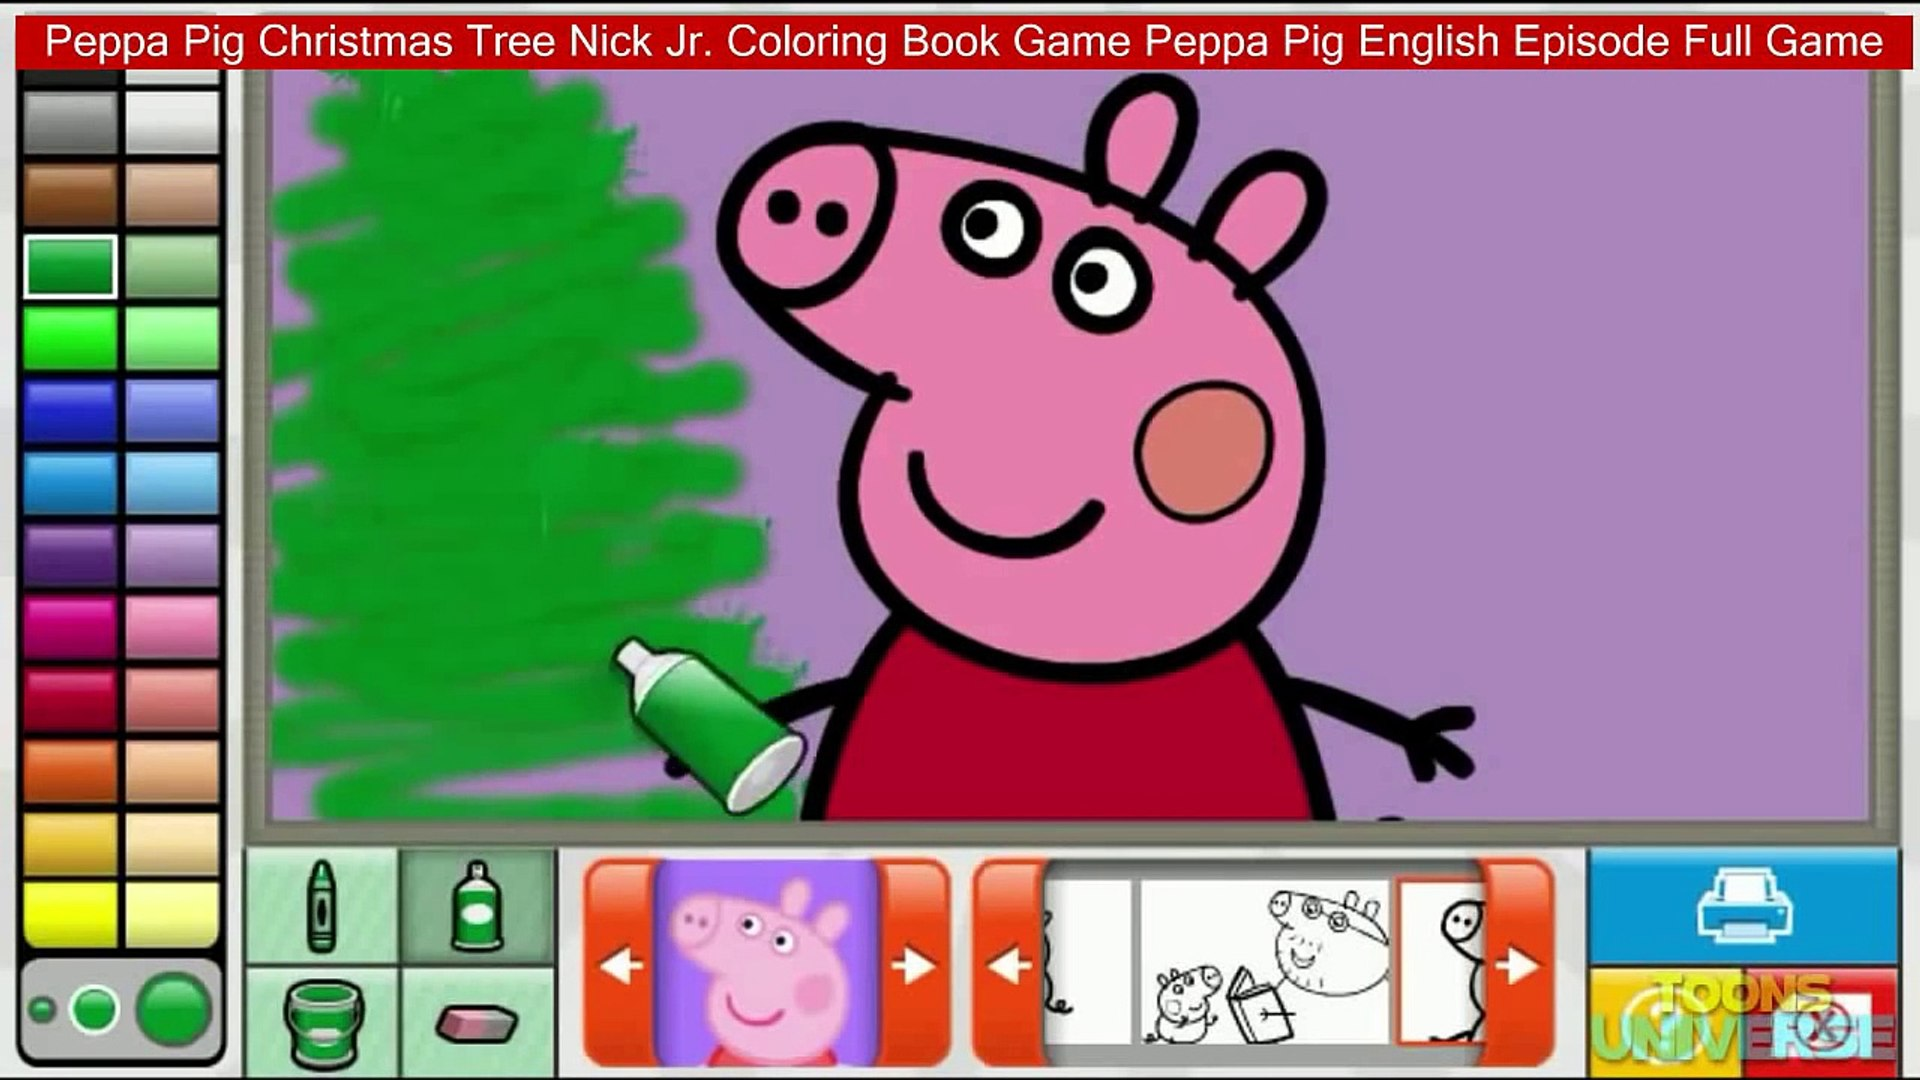 Peppa Pig Christmas Tree Nick Jr. Coloring Book Game Peppa Pig English  Episode Full Game